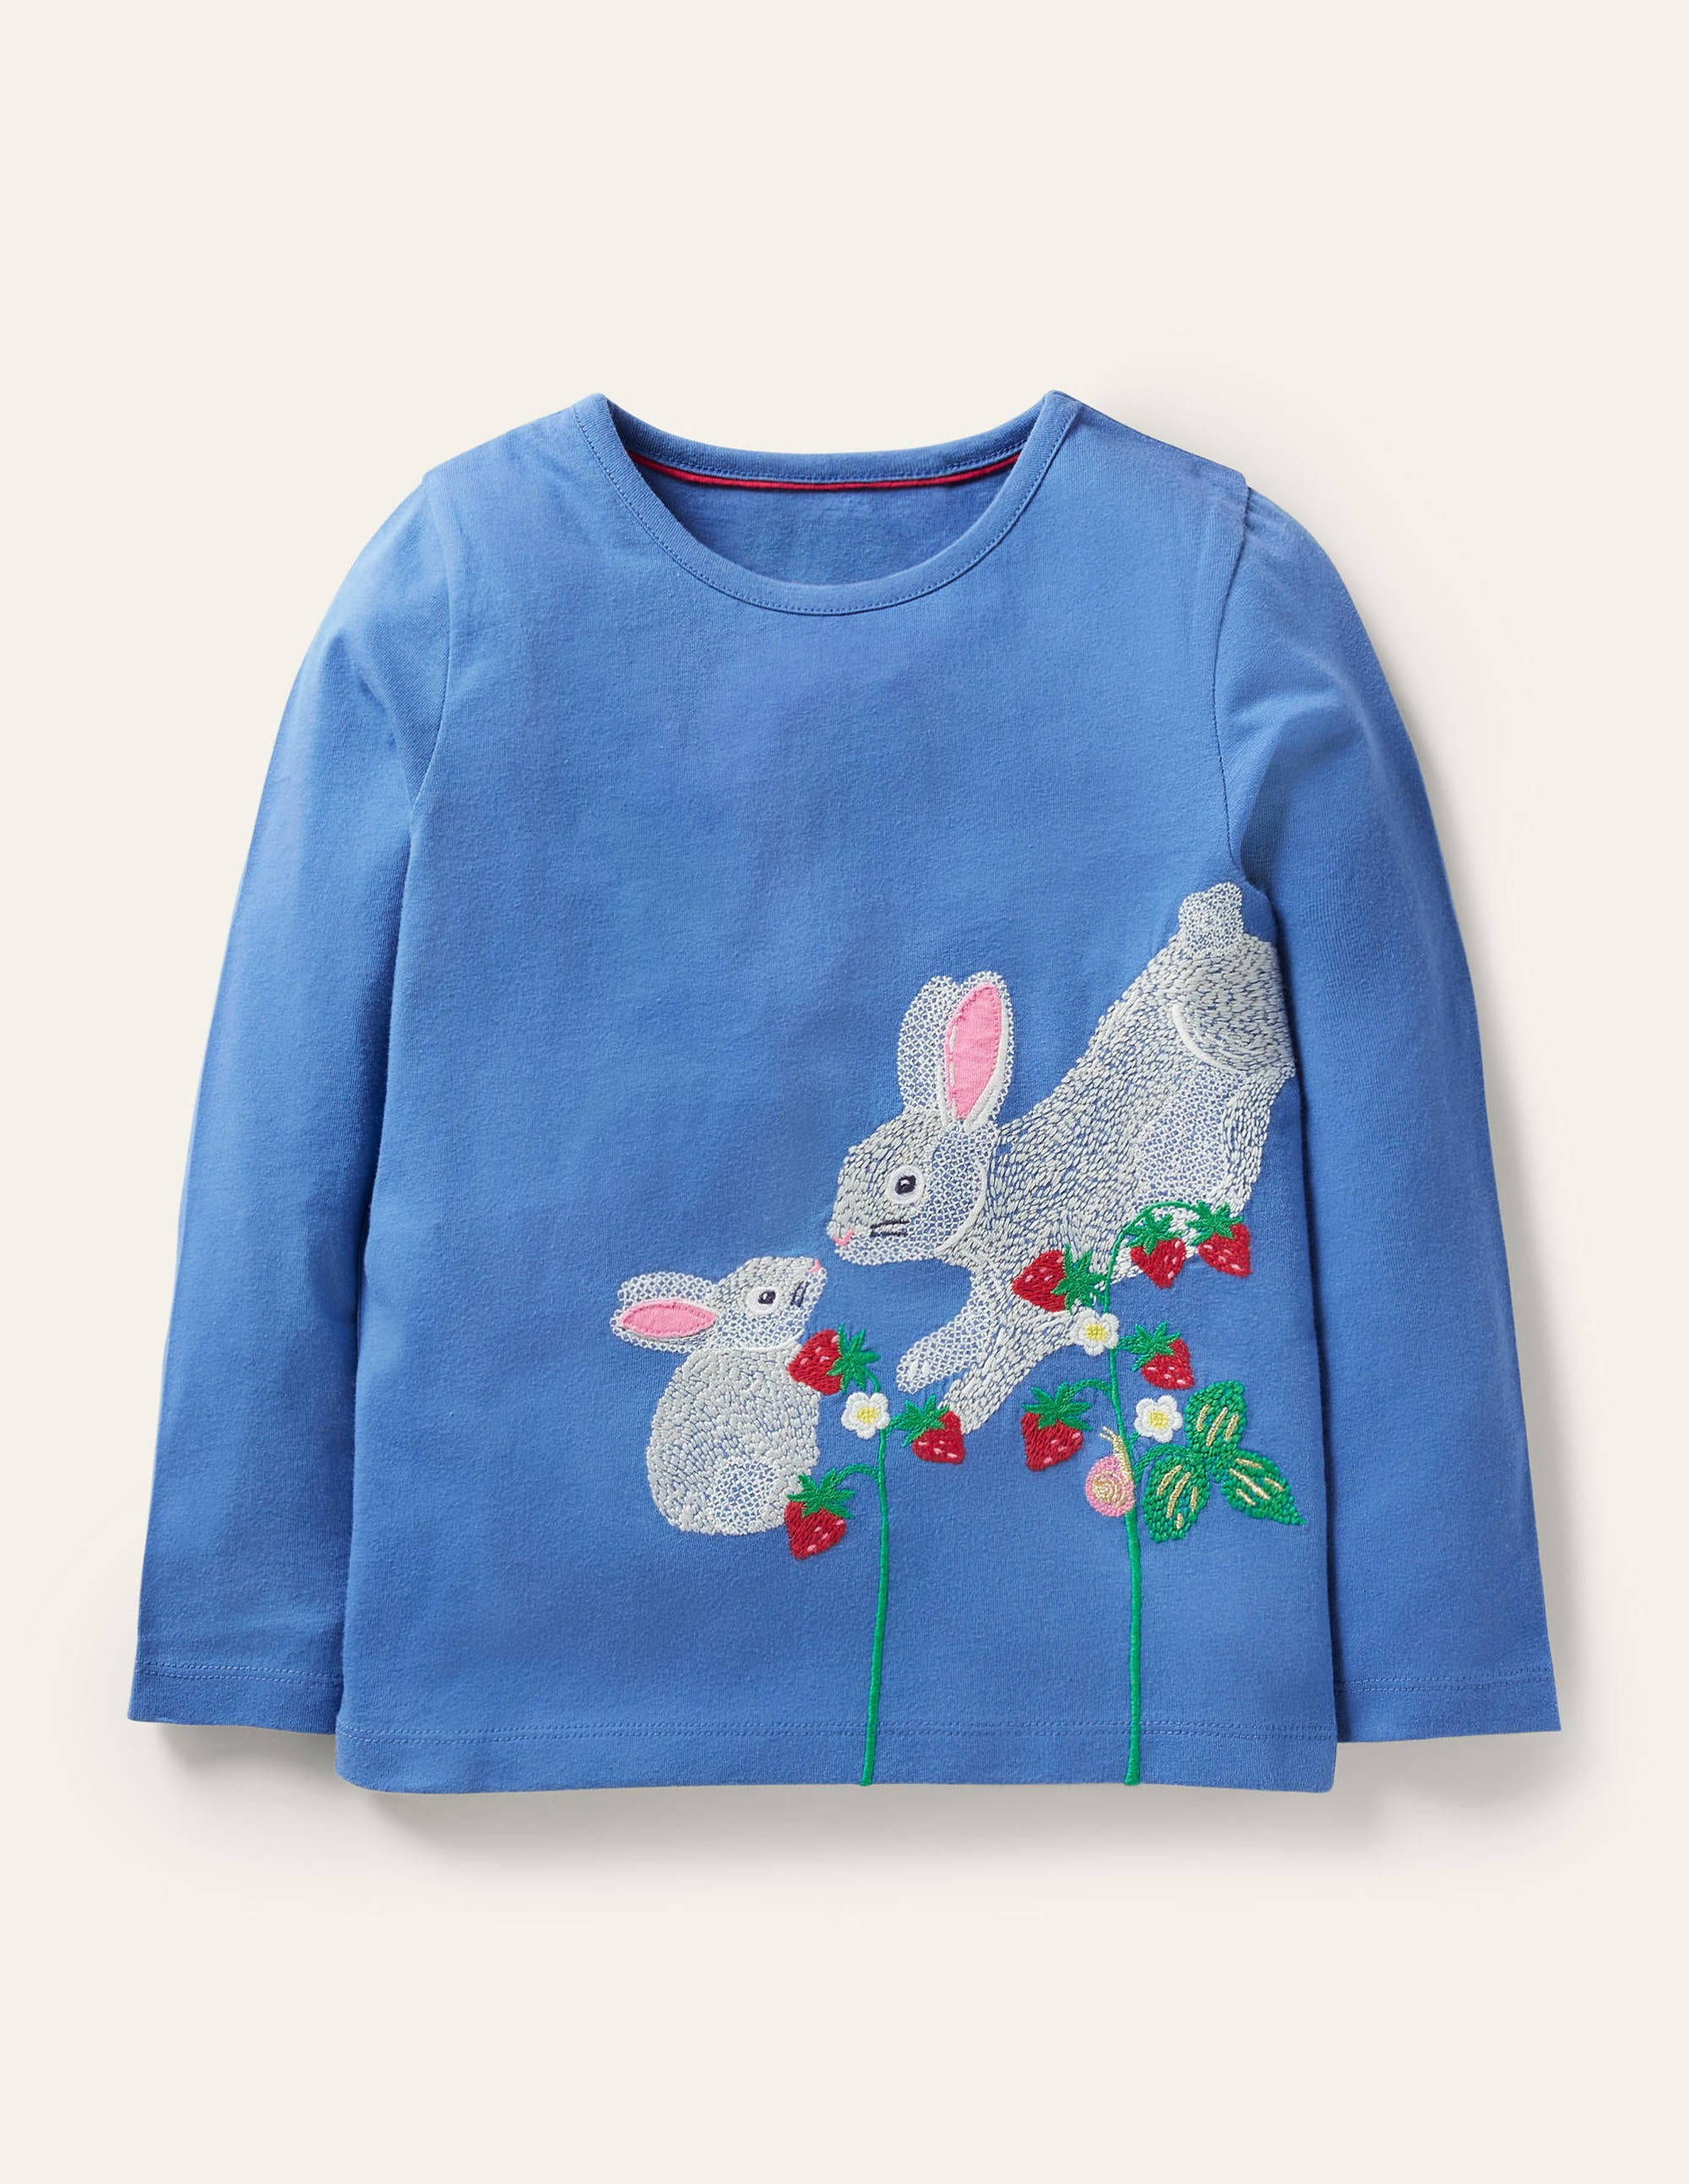 Boden Superstitch T-shirt - Elizabethan Blue Bunnies